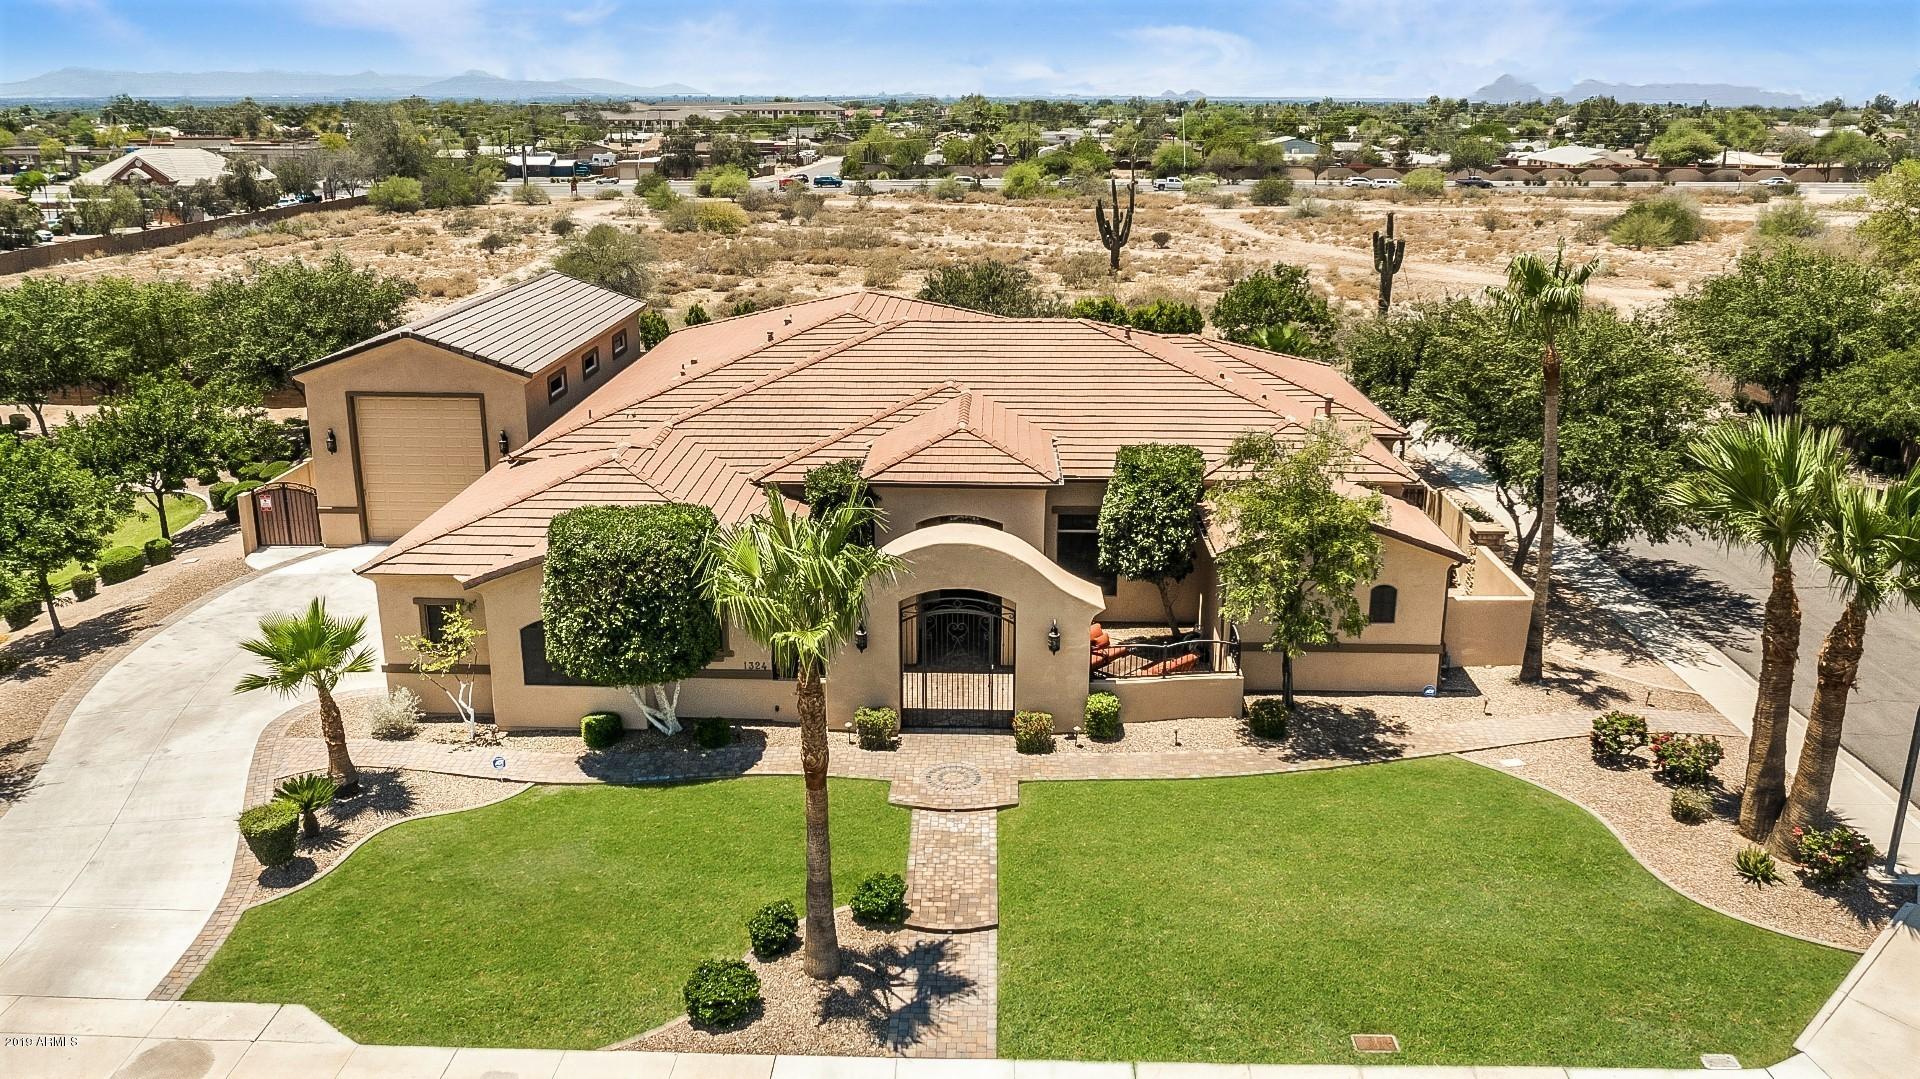 Photo of 1324 N 69TH Place, Mesa, AZ 85207